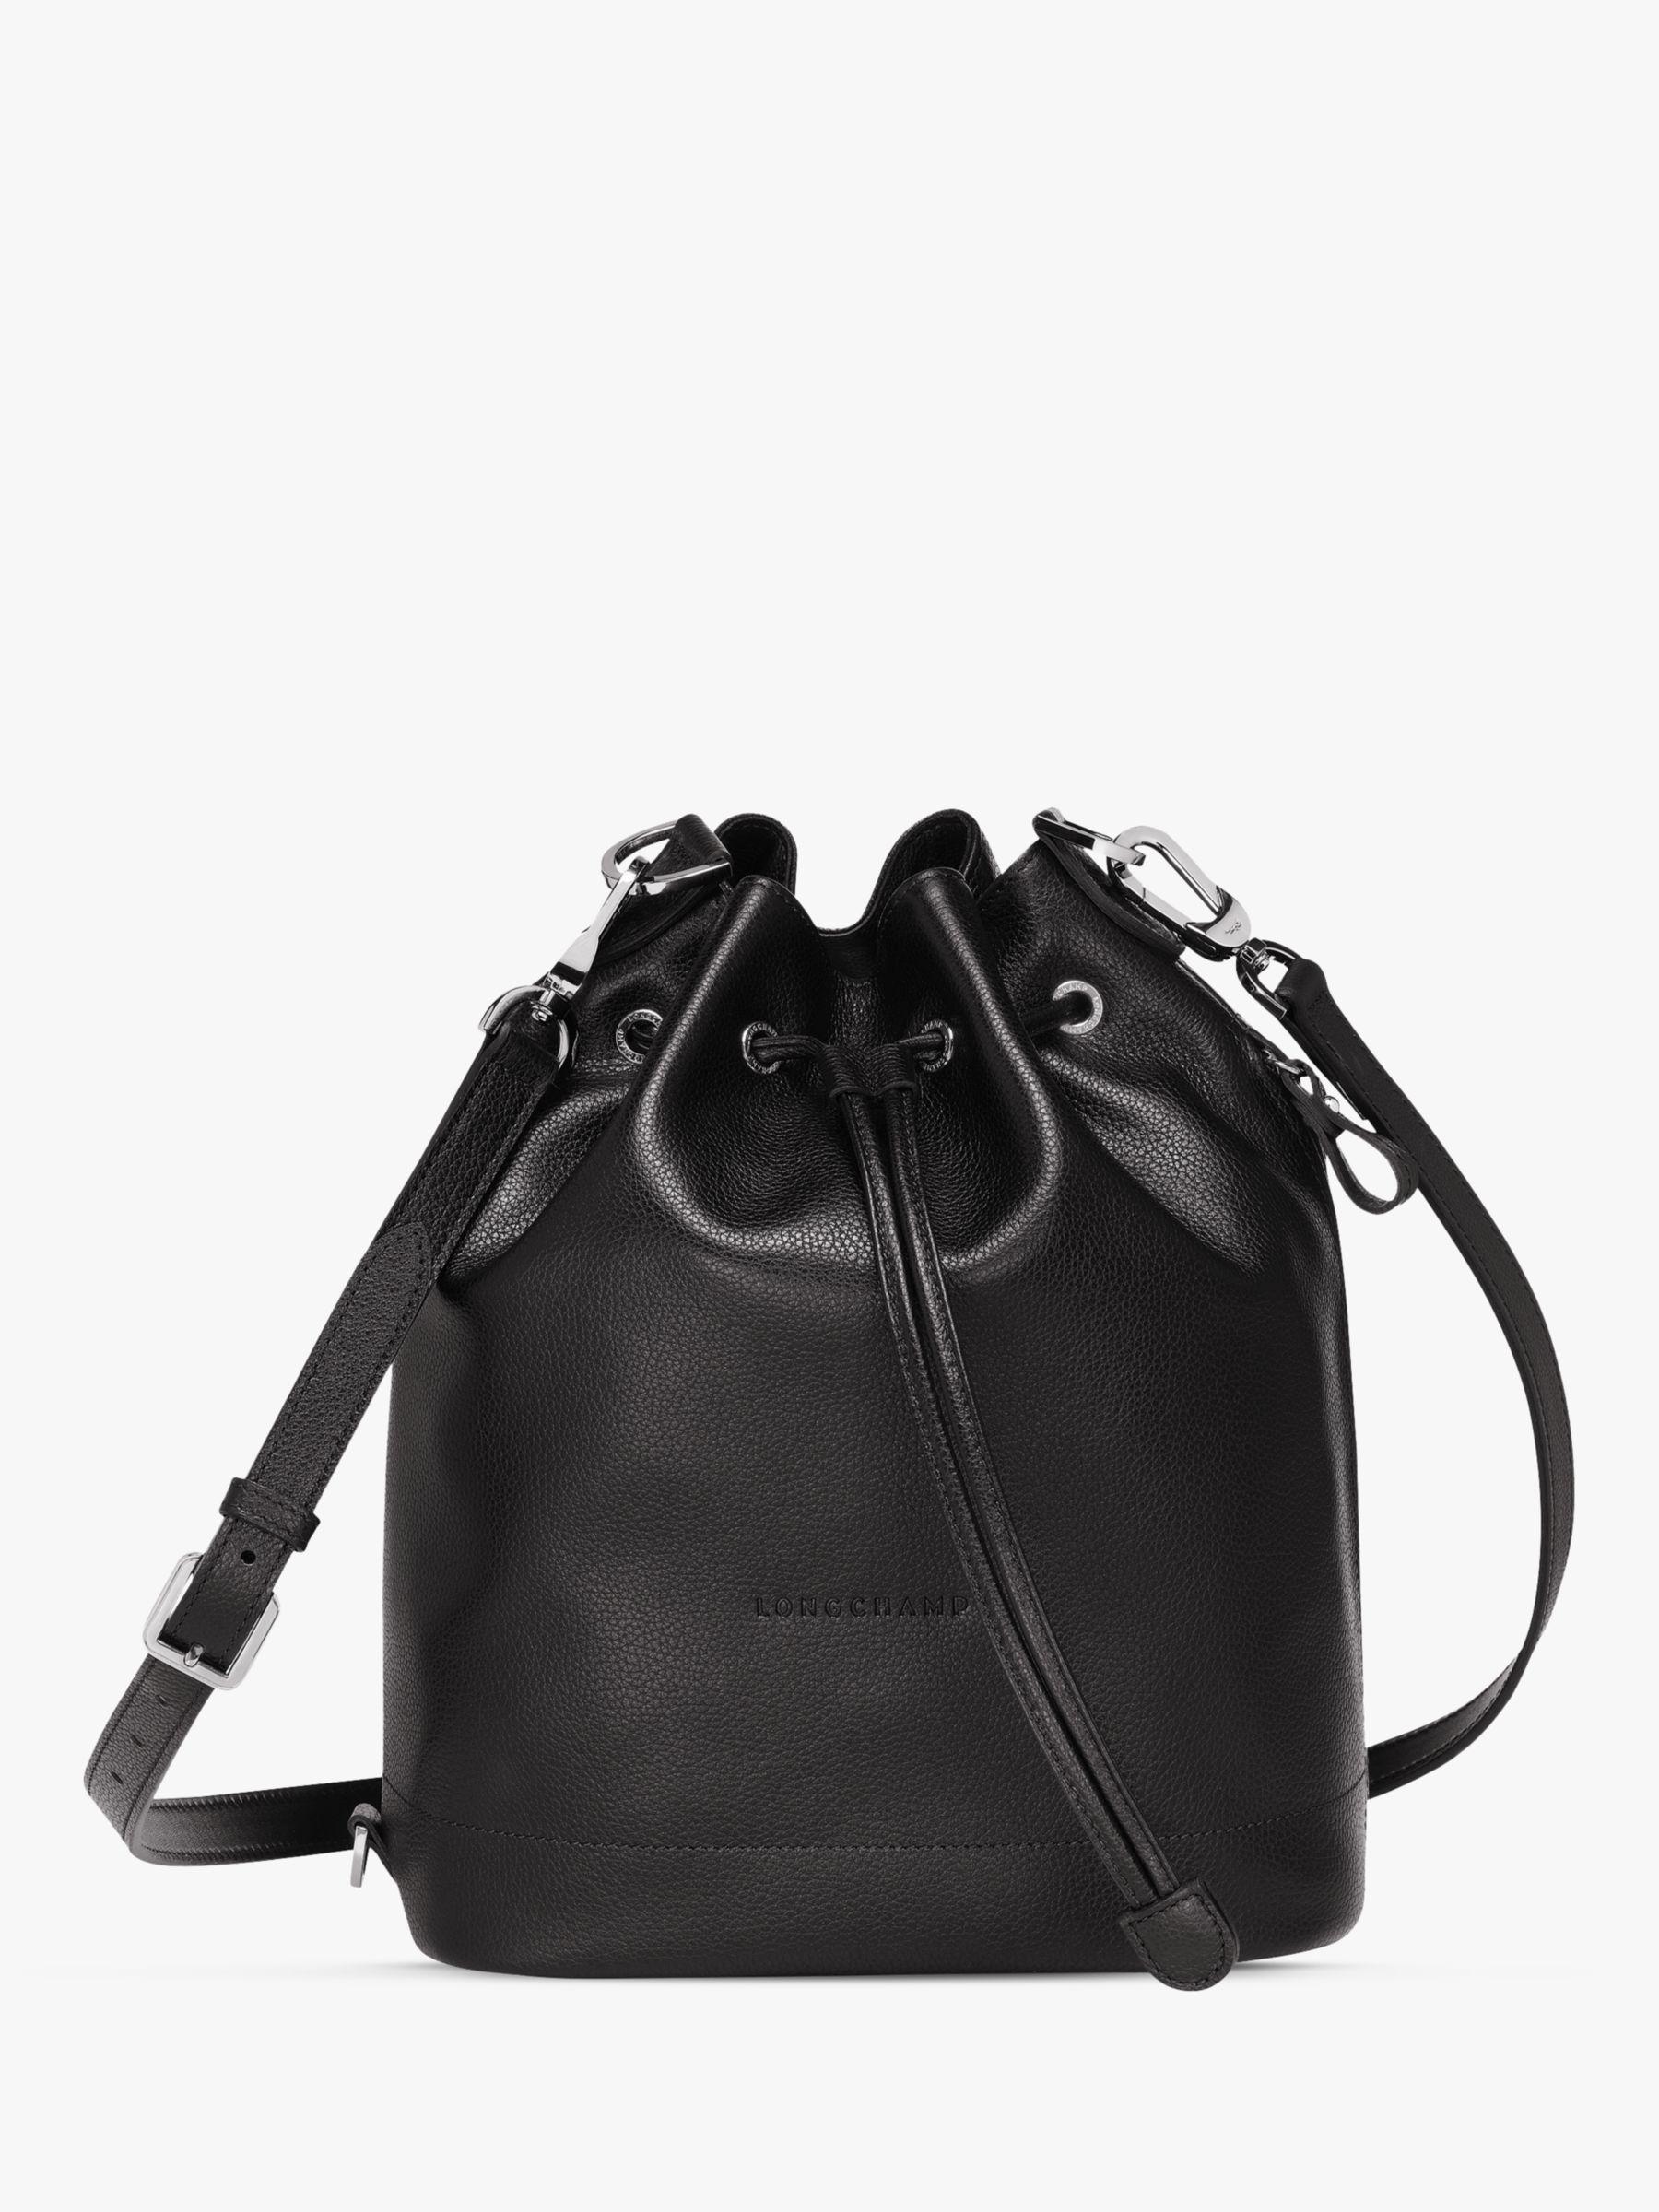 Longchamp Le Foulonné Medium Leather Bucket Bag, Black